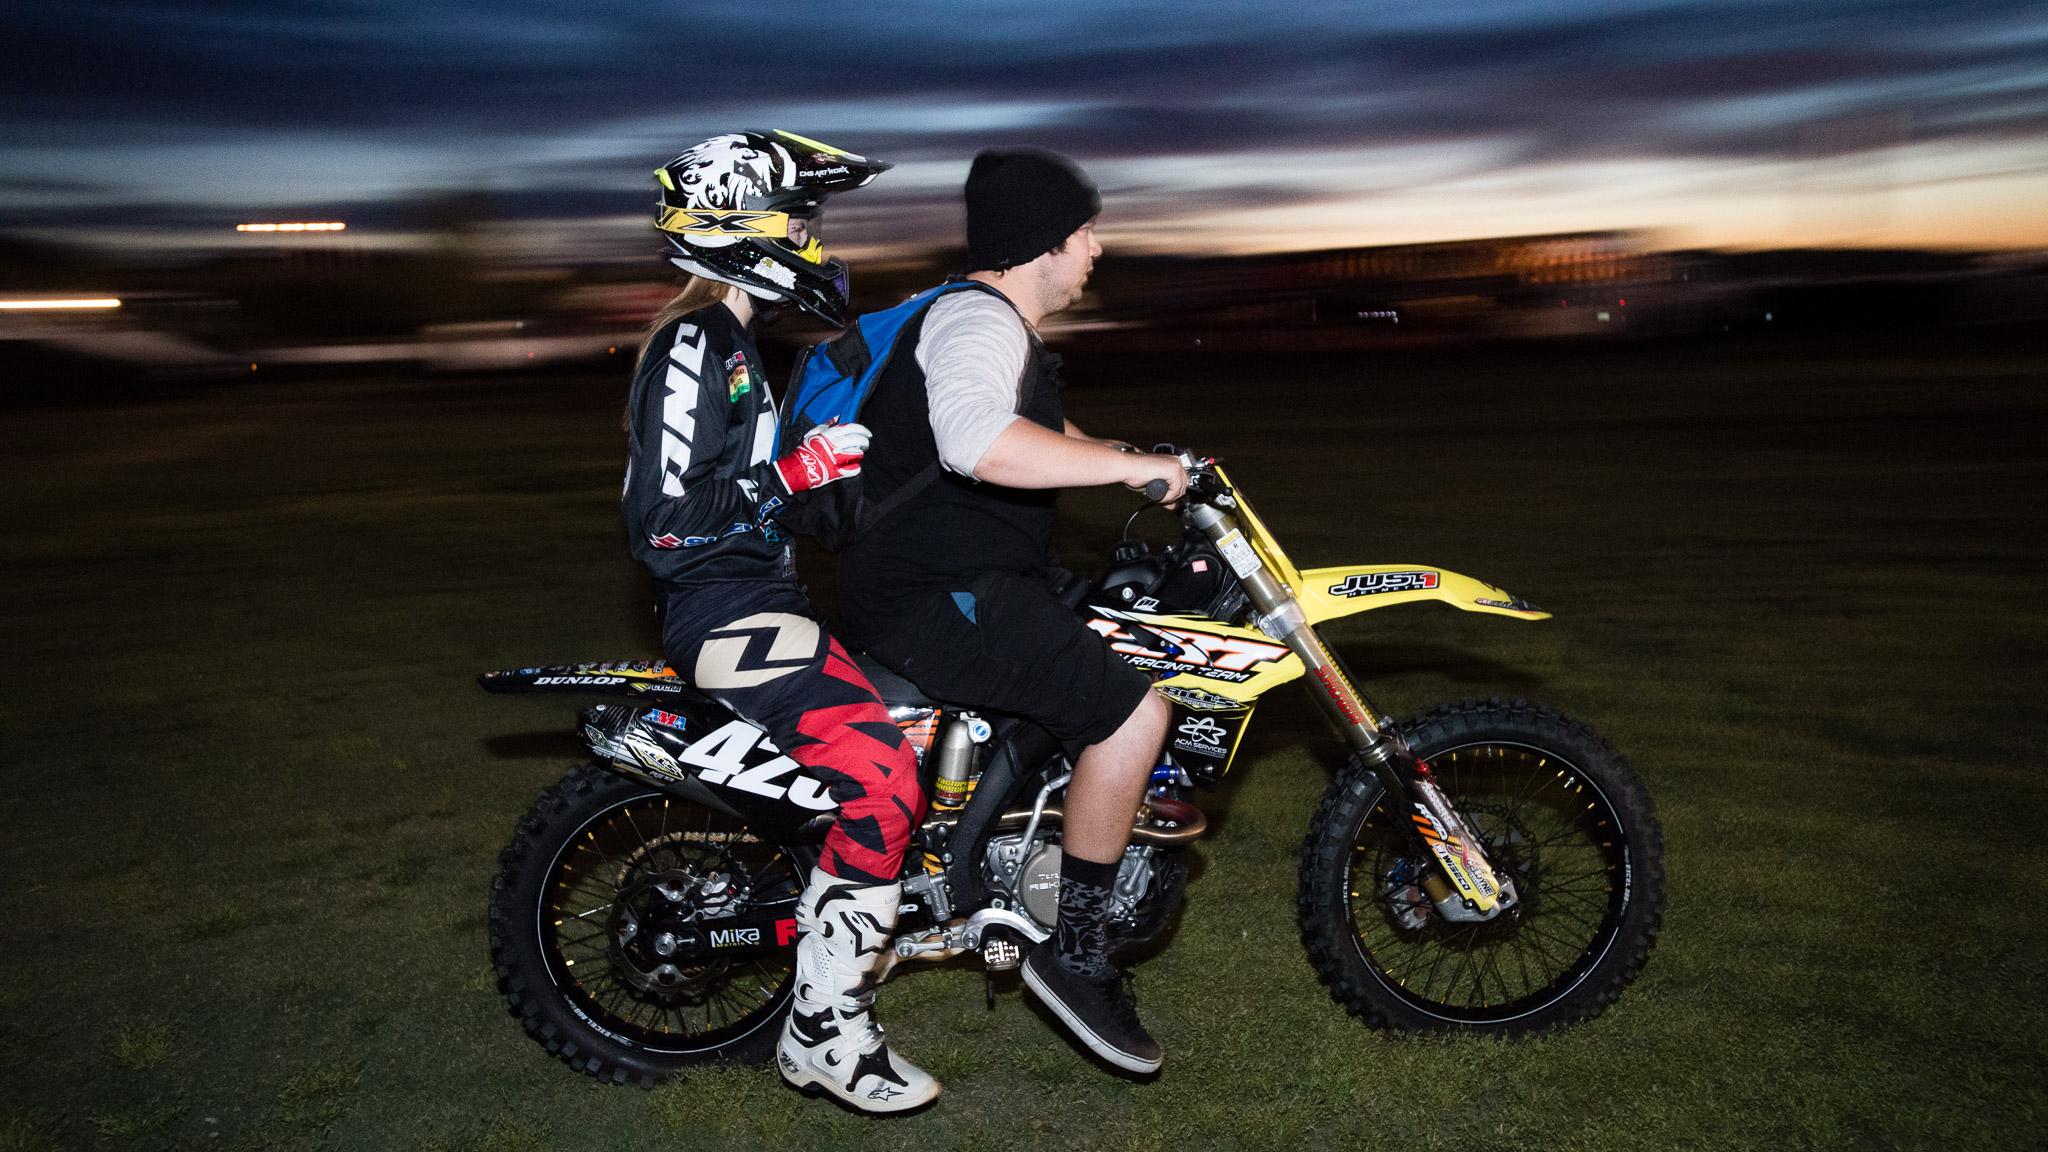 Tandem moto ride